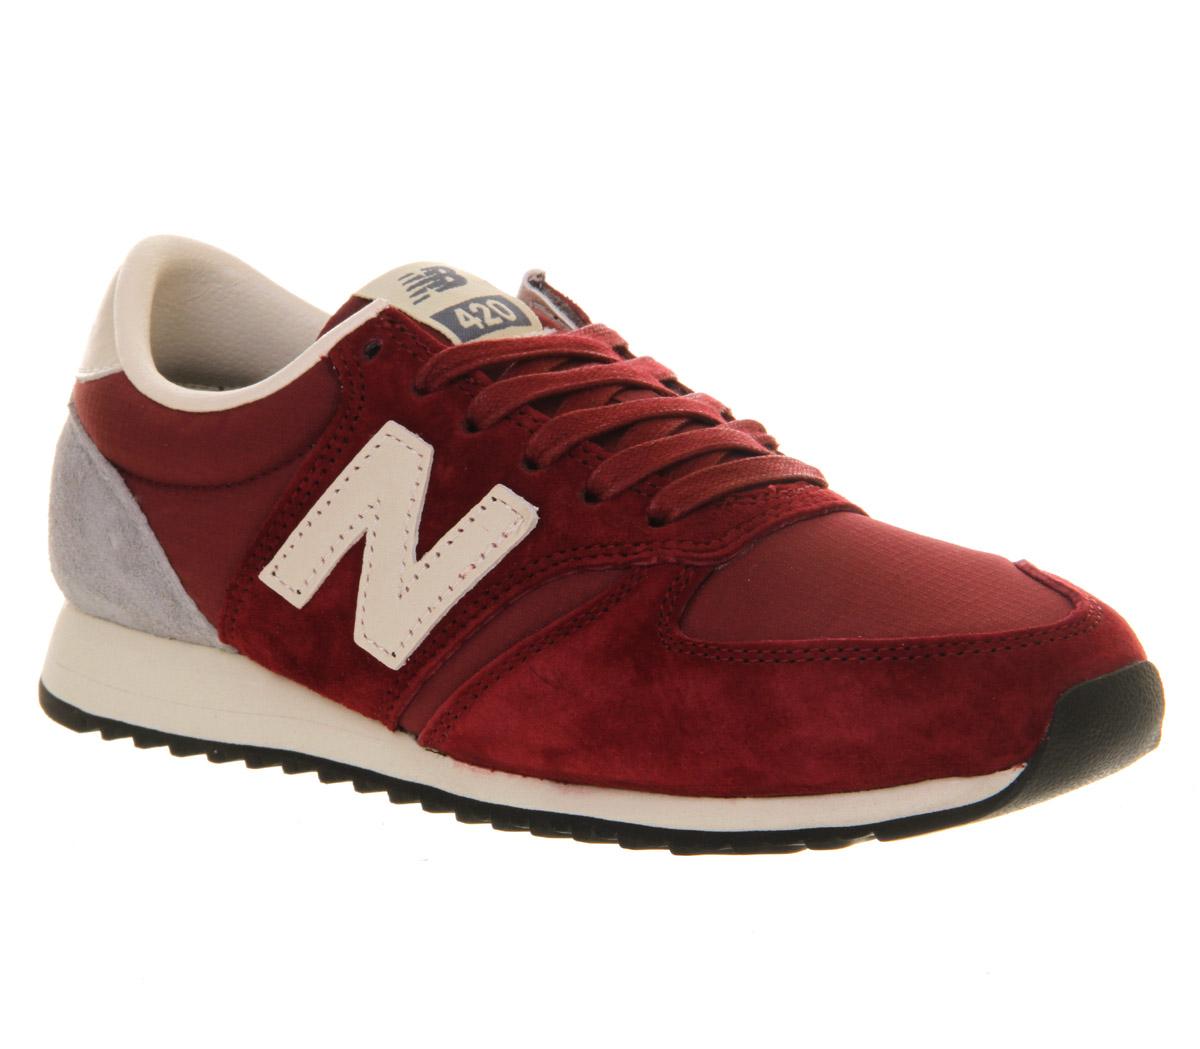 Mens New Balance U420 DARK RED Trainers Shoes | eBay